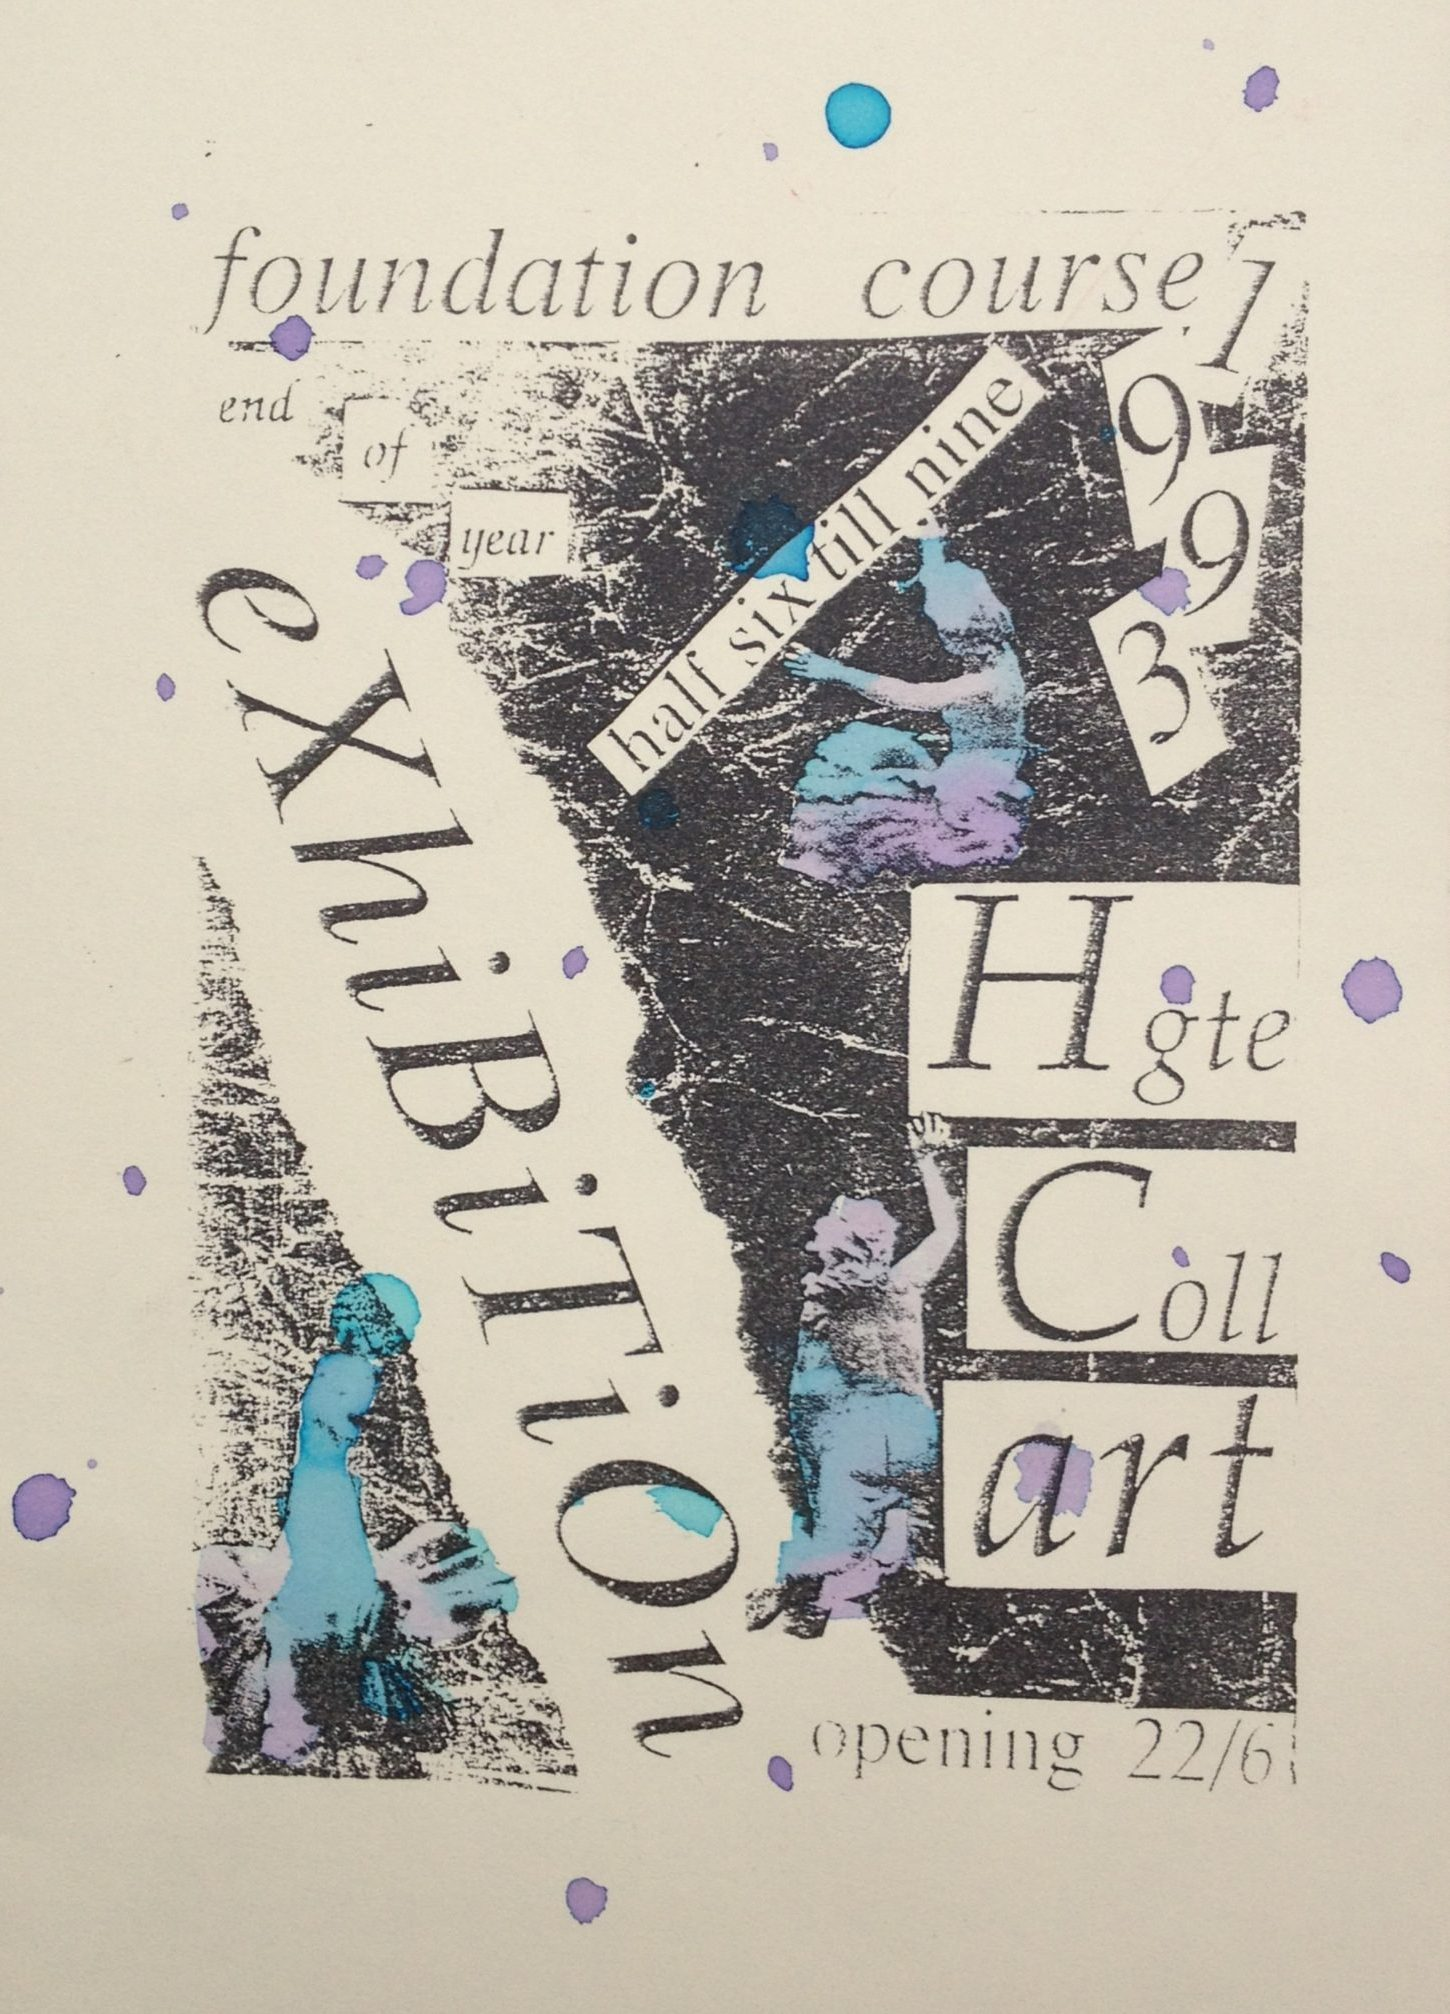 harrogate art college exhibition flyer 1993